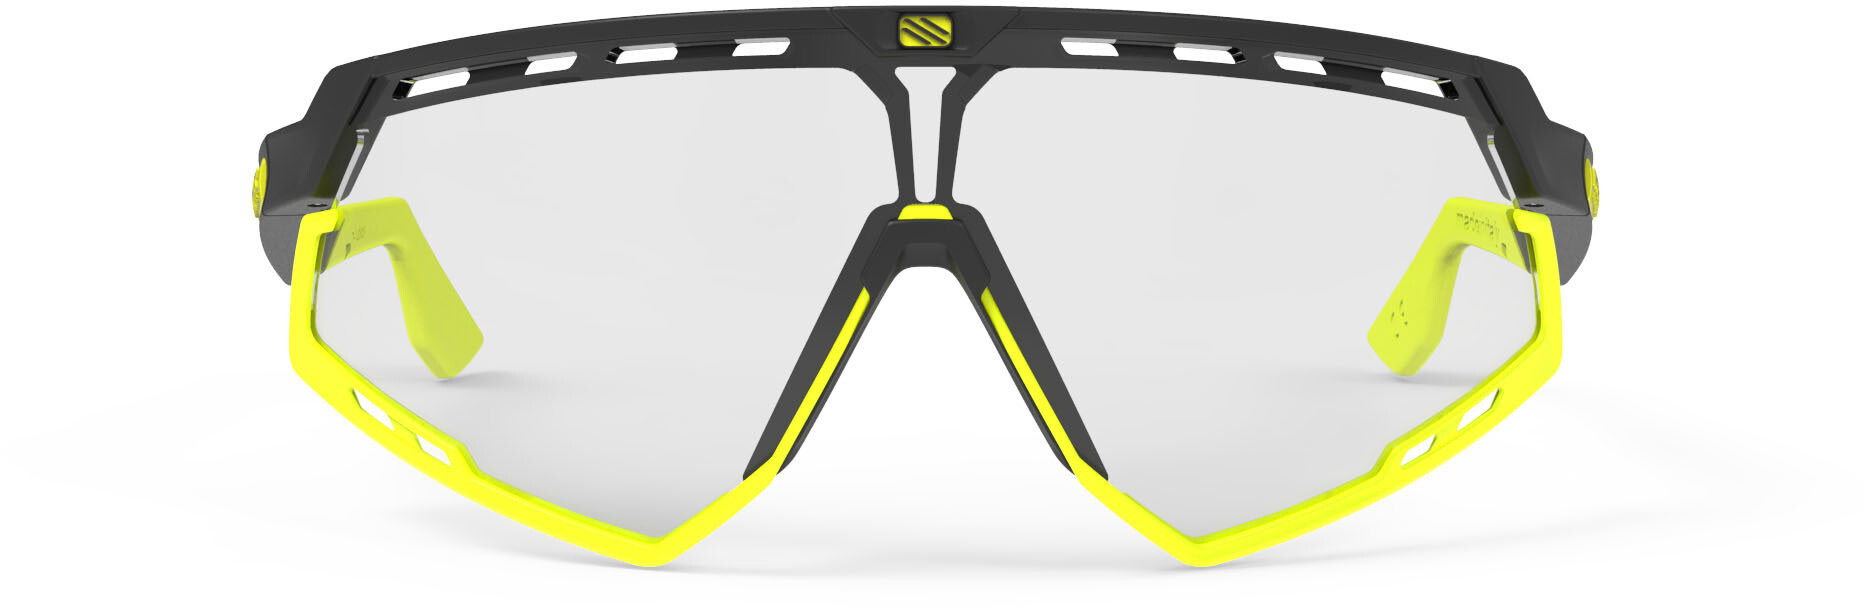 de973d1a98a9c Rudy Project Defender Bike Glasses yellow black at Bikester.co.uk